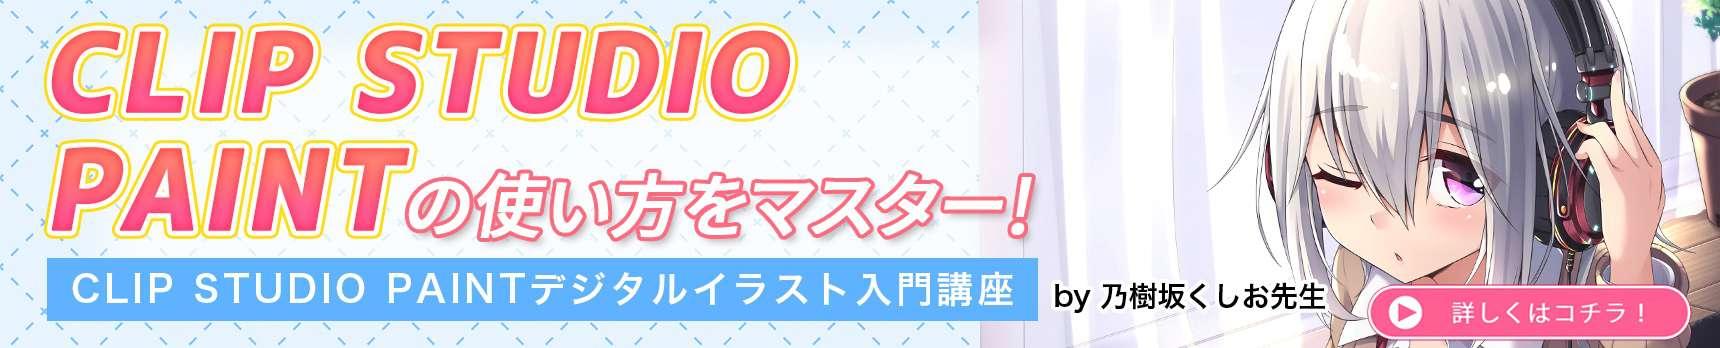 Nogizaka banner pc